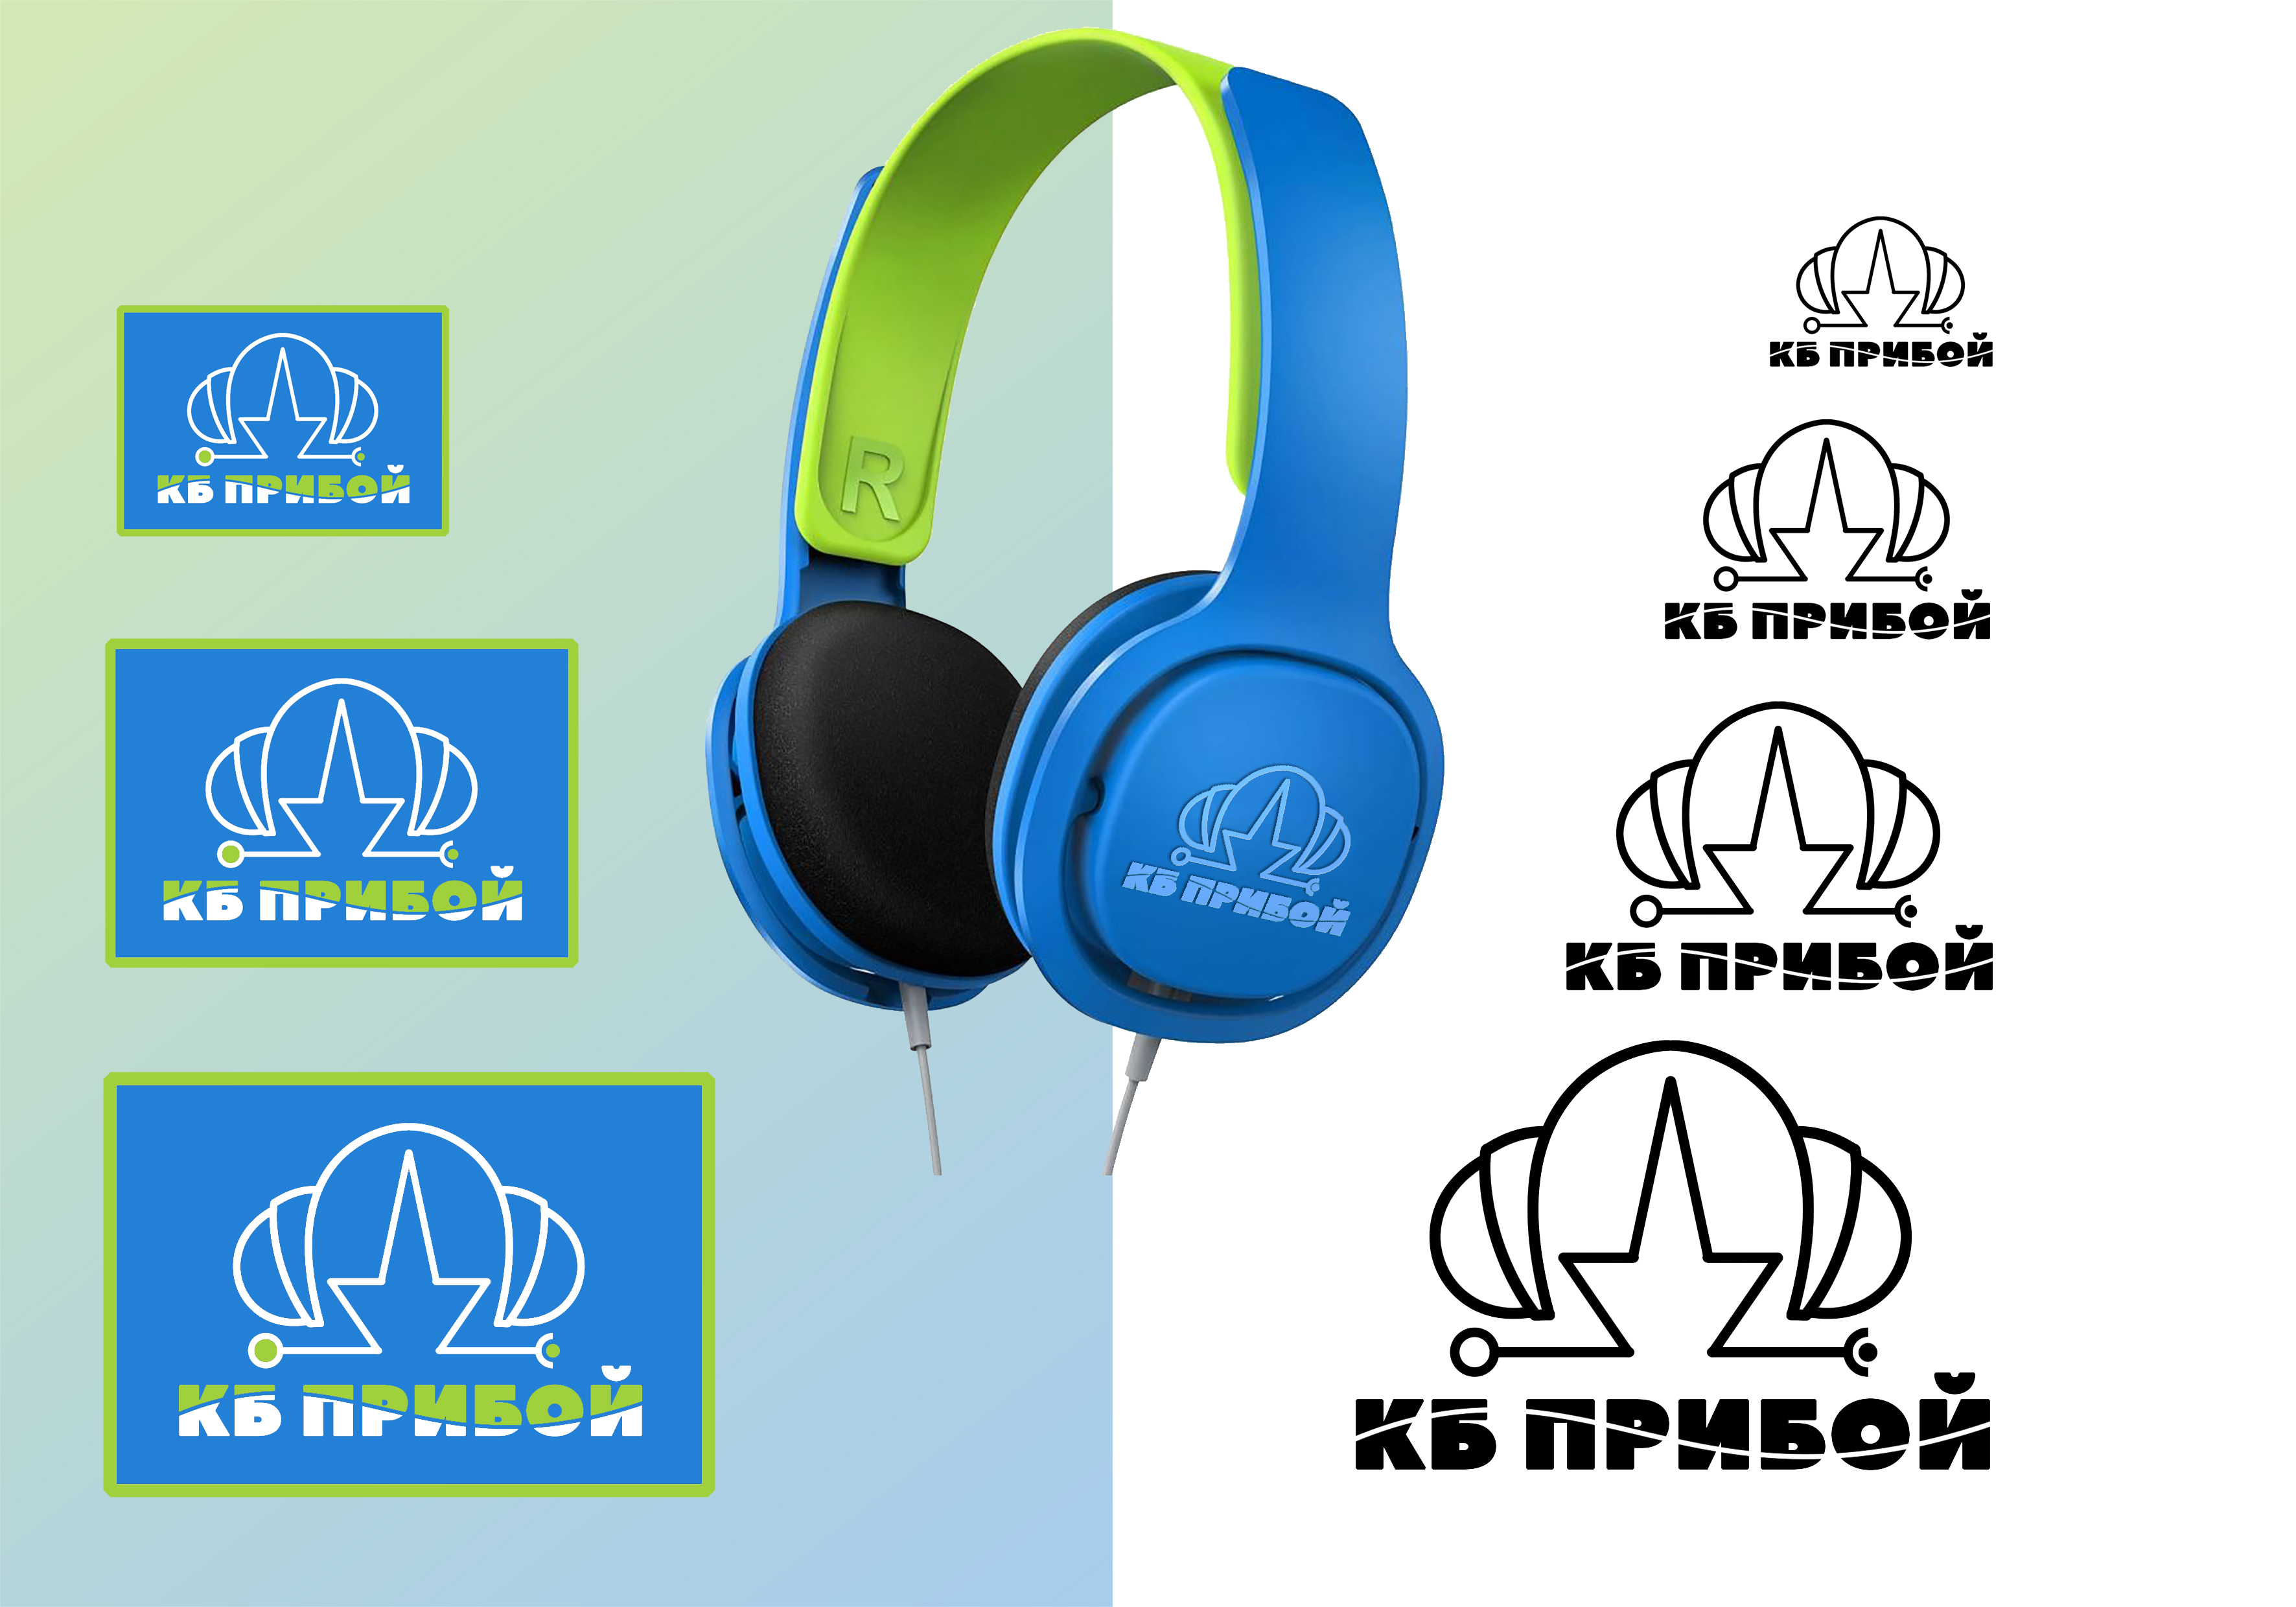 Разработка логотипа и фирменного стиля для КБ Прибой фото f_6965b280fdca6660.jpg